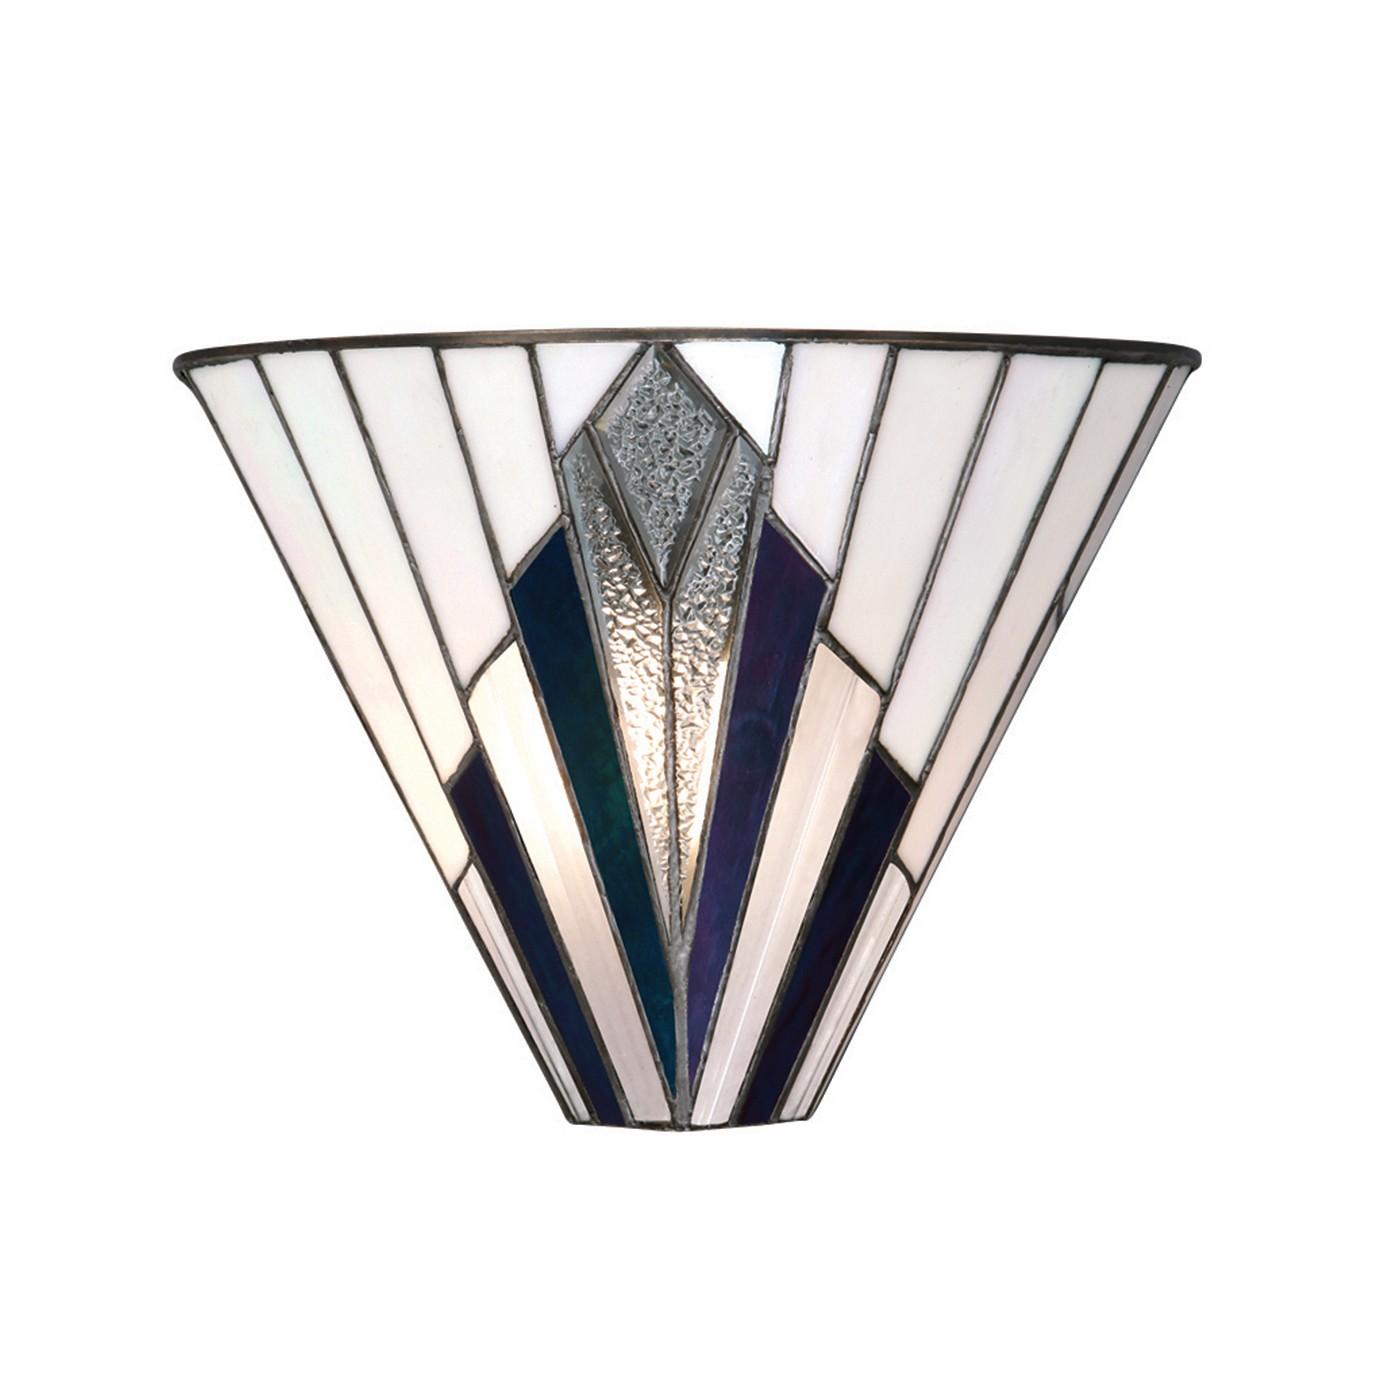 Astoria 63940 Tiffany Wall Light Lighting Bug Swindon